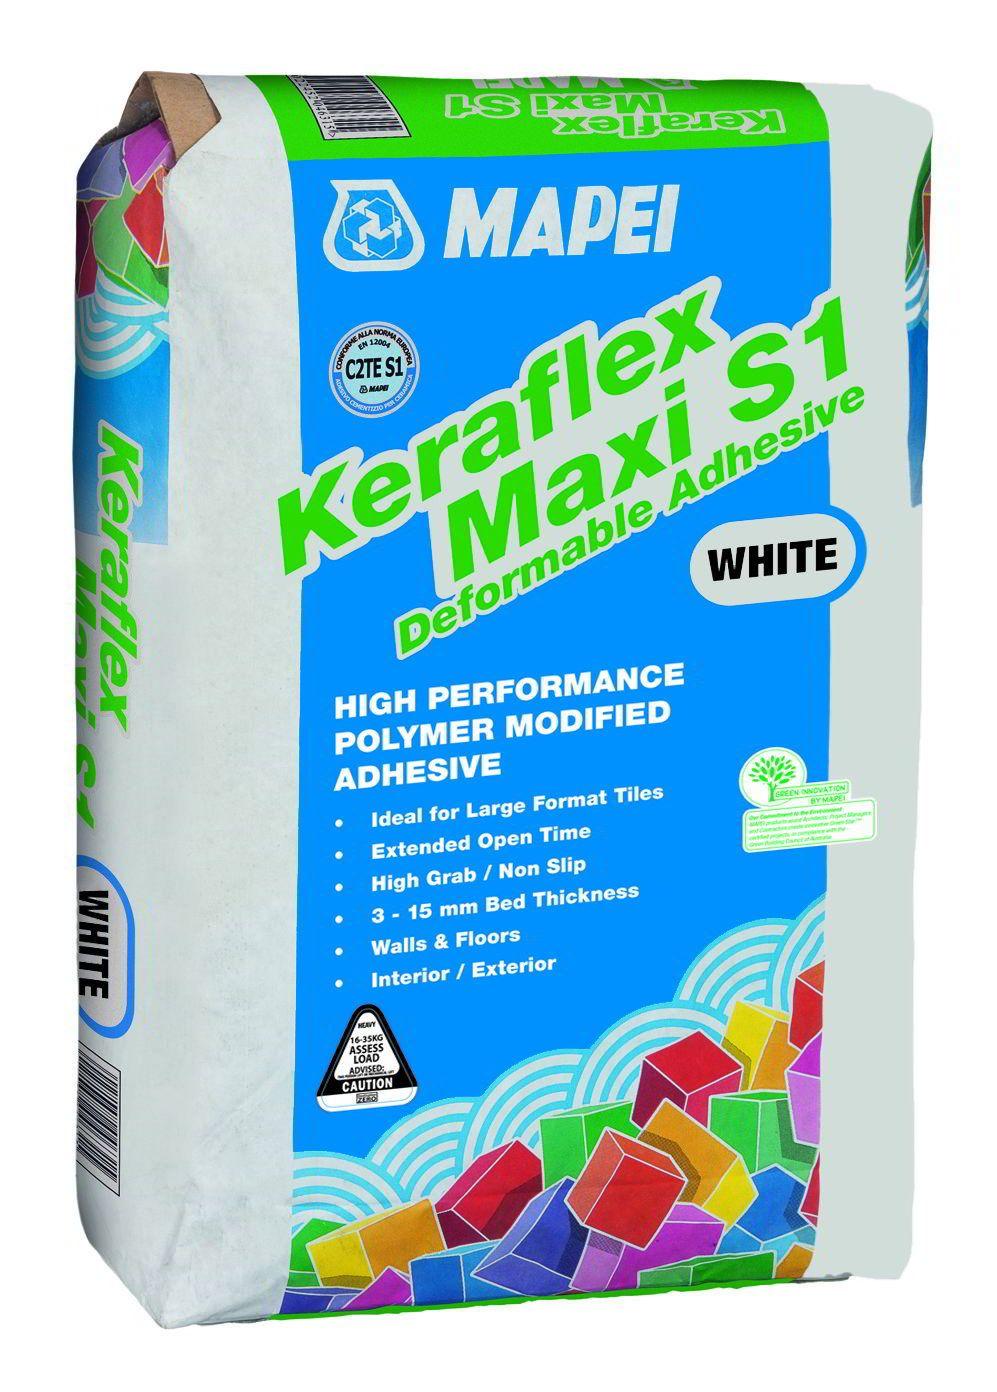 Mapei / Keraflex Maxi S1